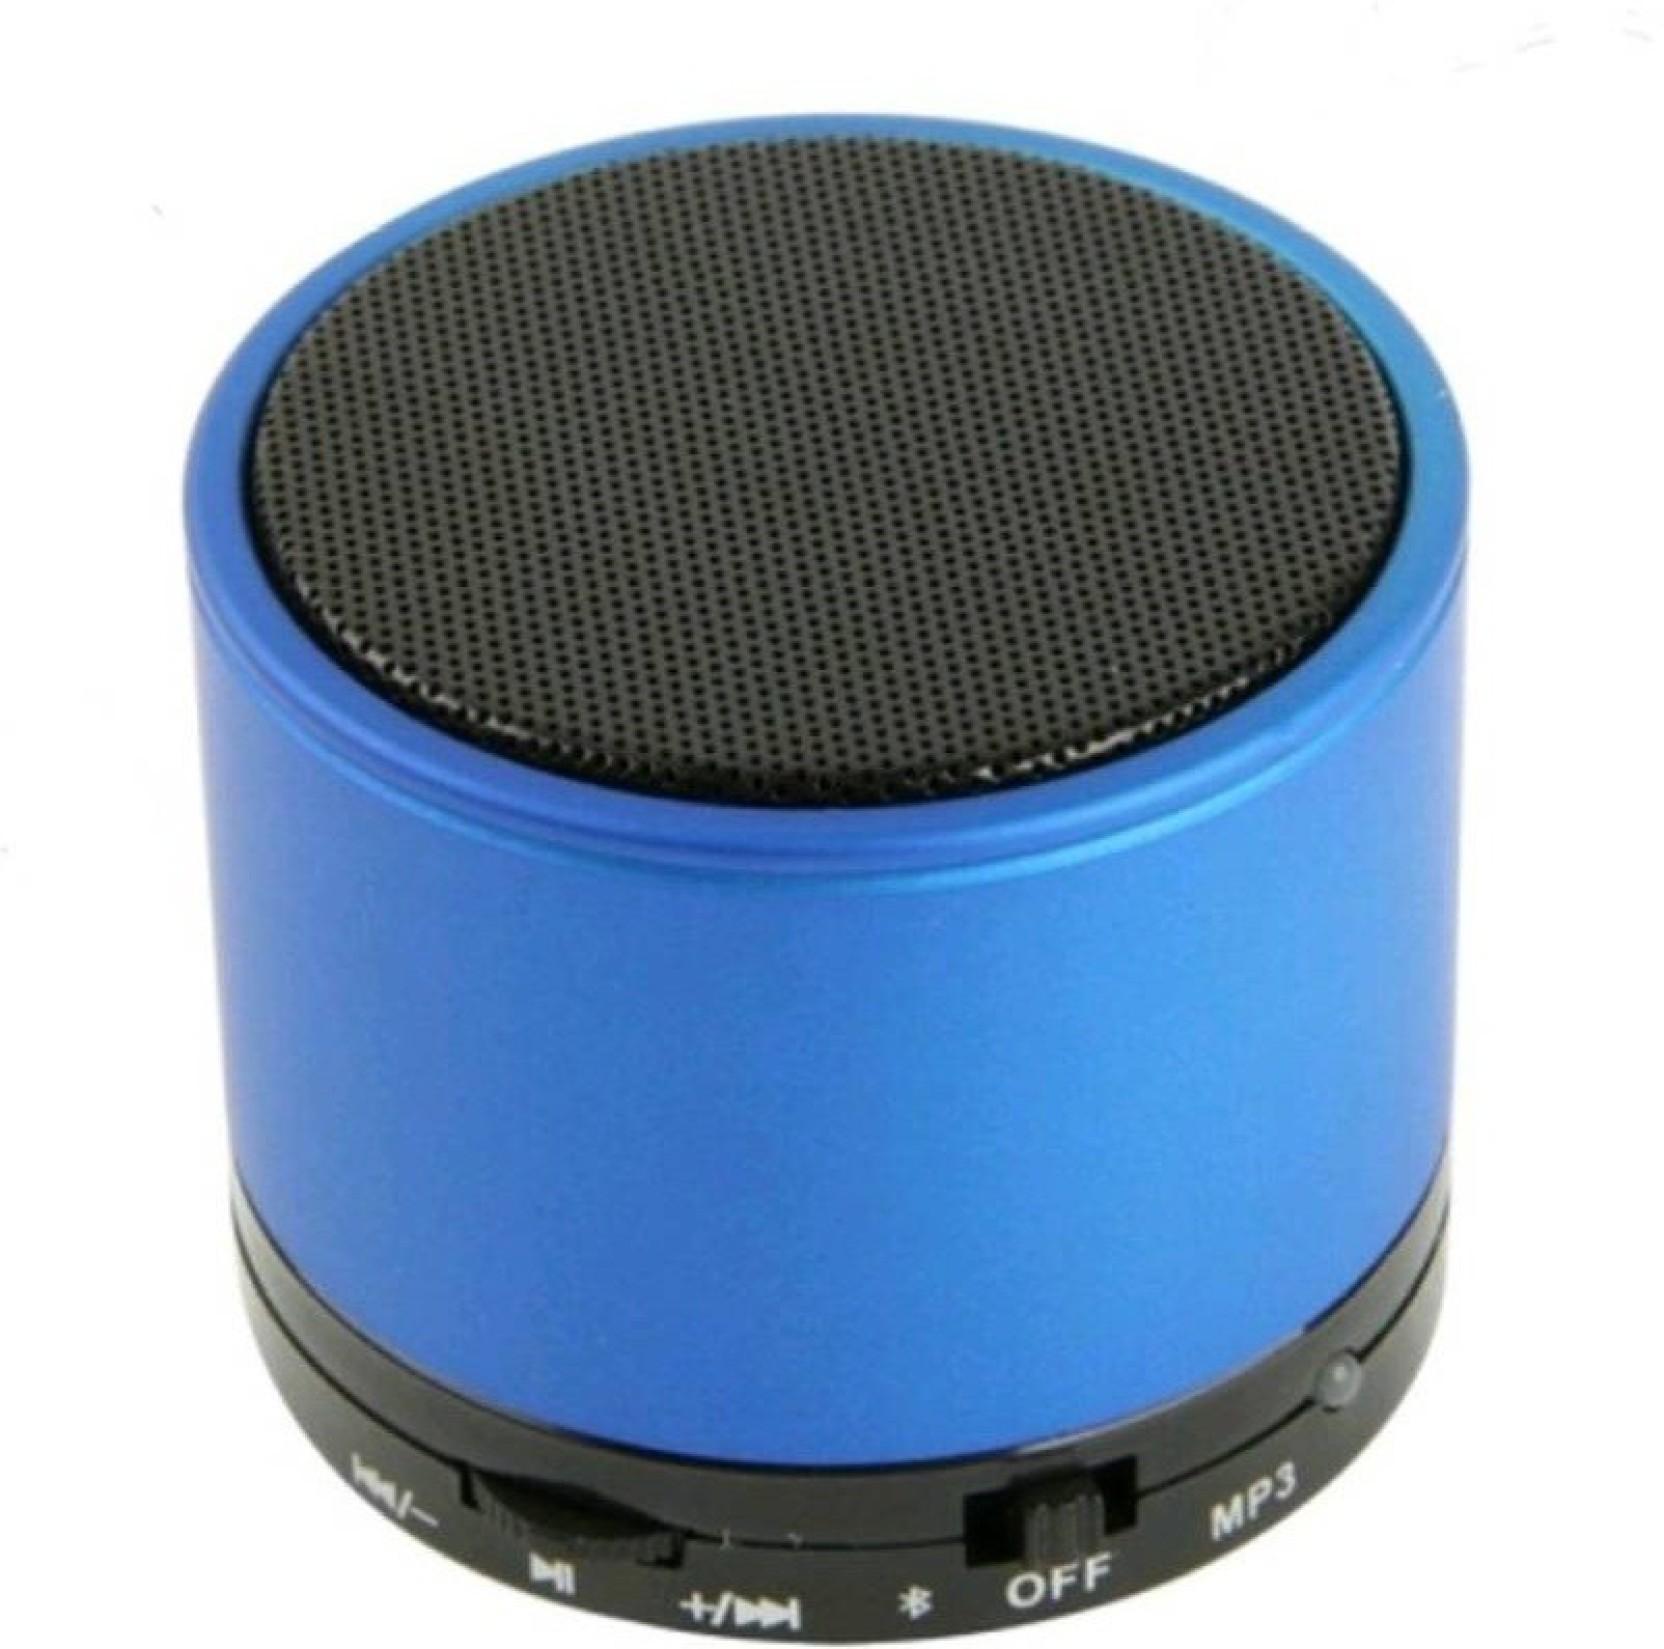 Buy Bkt Mini Mushroom Music Box Fm Bluetooth Card Reader Pen Drive 3 Musik Speaker Portable Compare